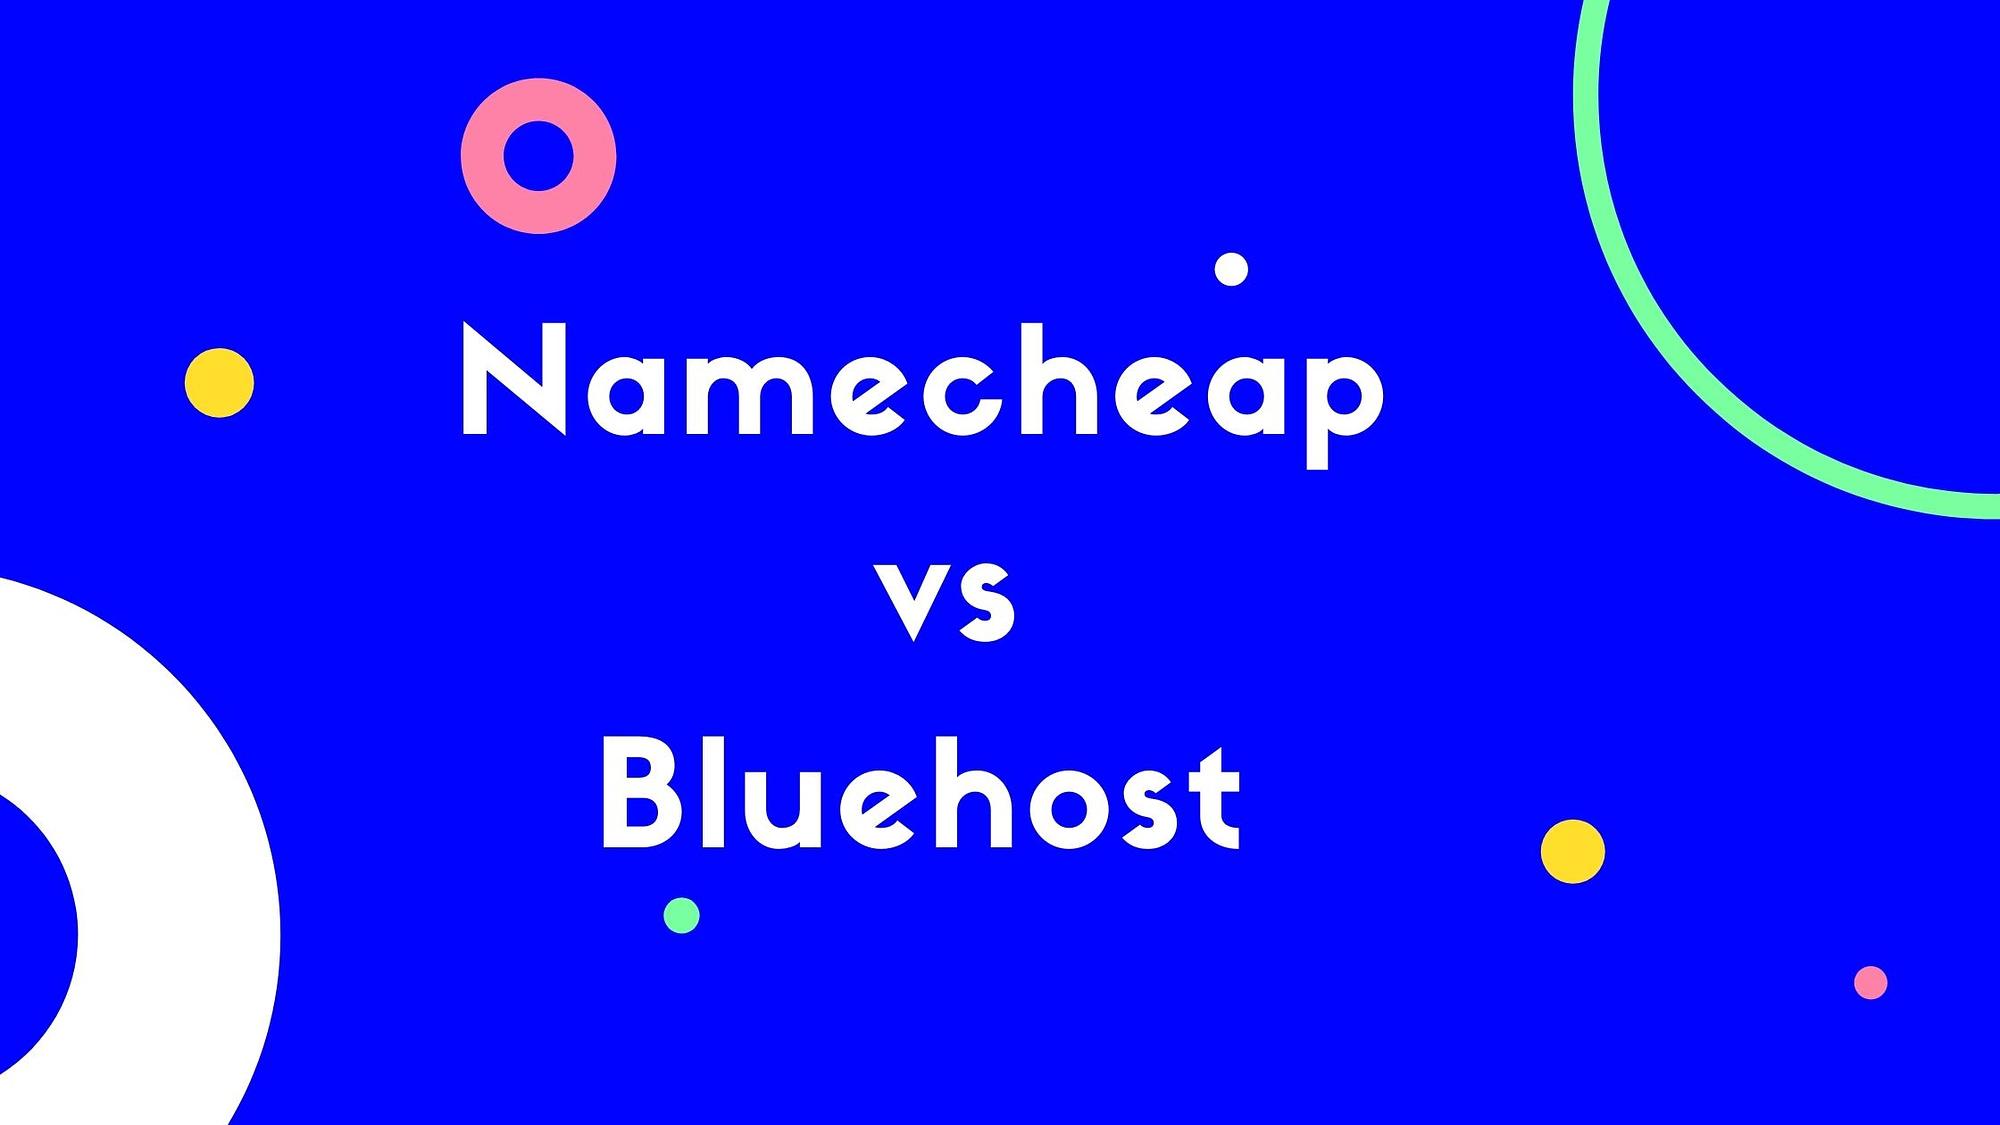 Namecheap vs Bluehost Featured Image